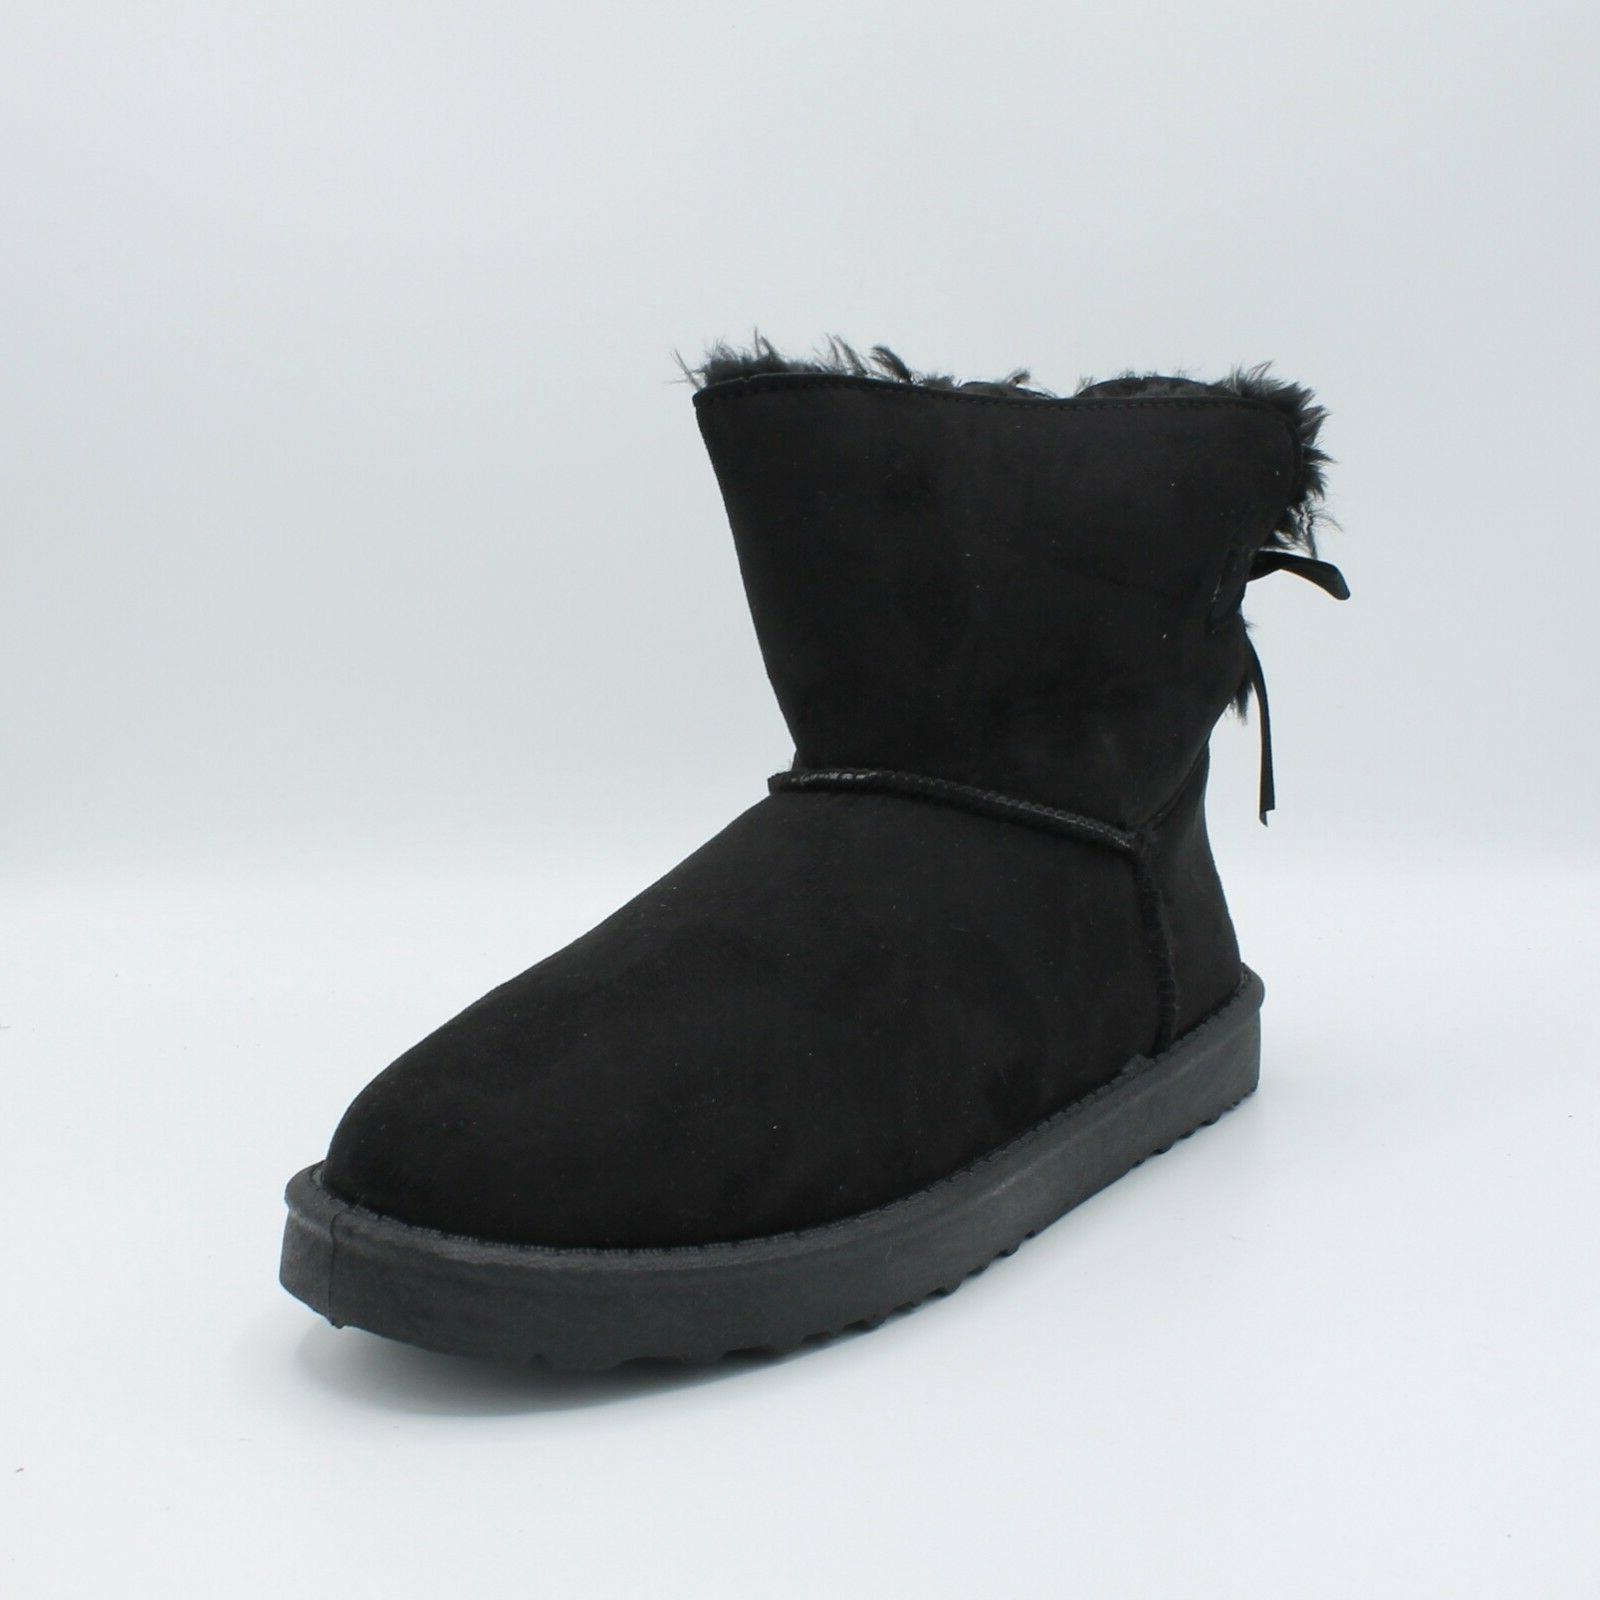 Boots Fur Booties Hair